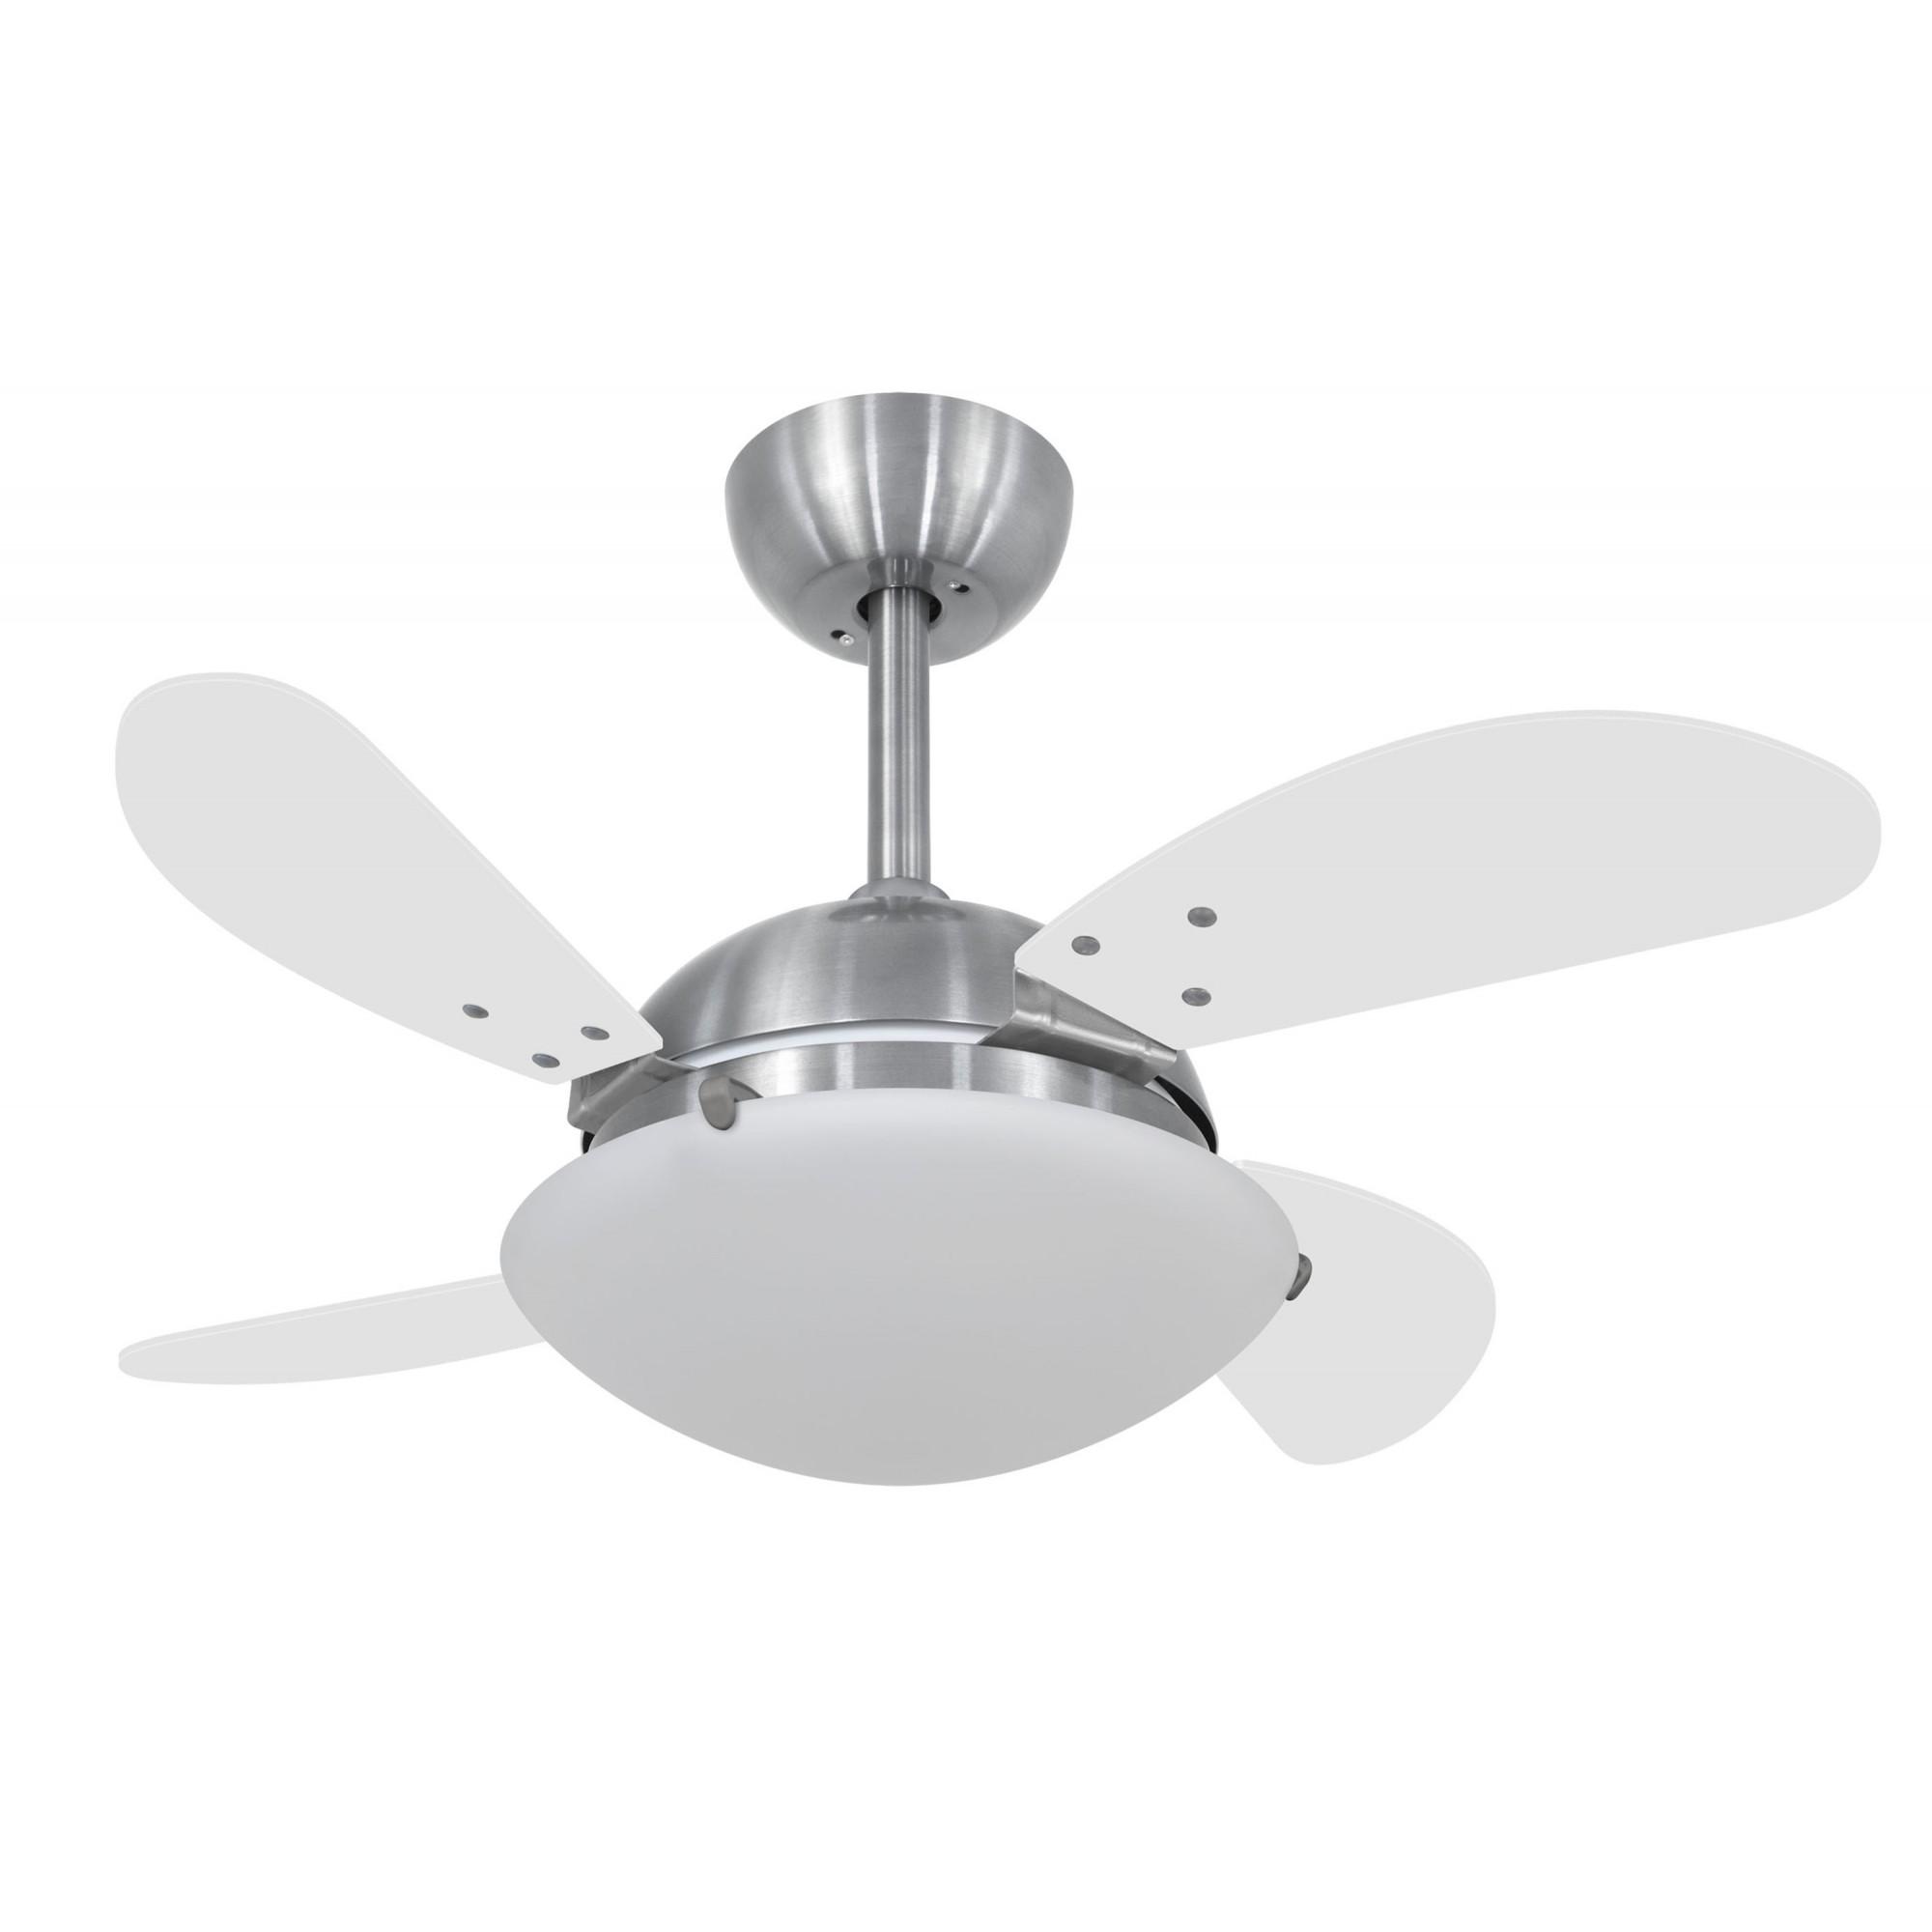 Ventilador de Teto VD300 Mini Fly Prata 4Pás MDF Branco 220V